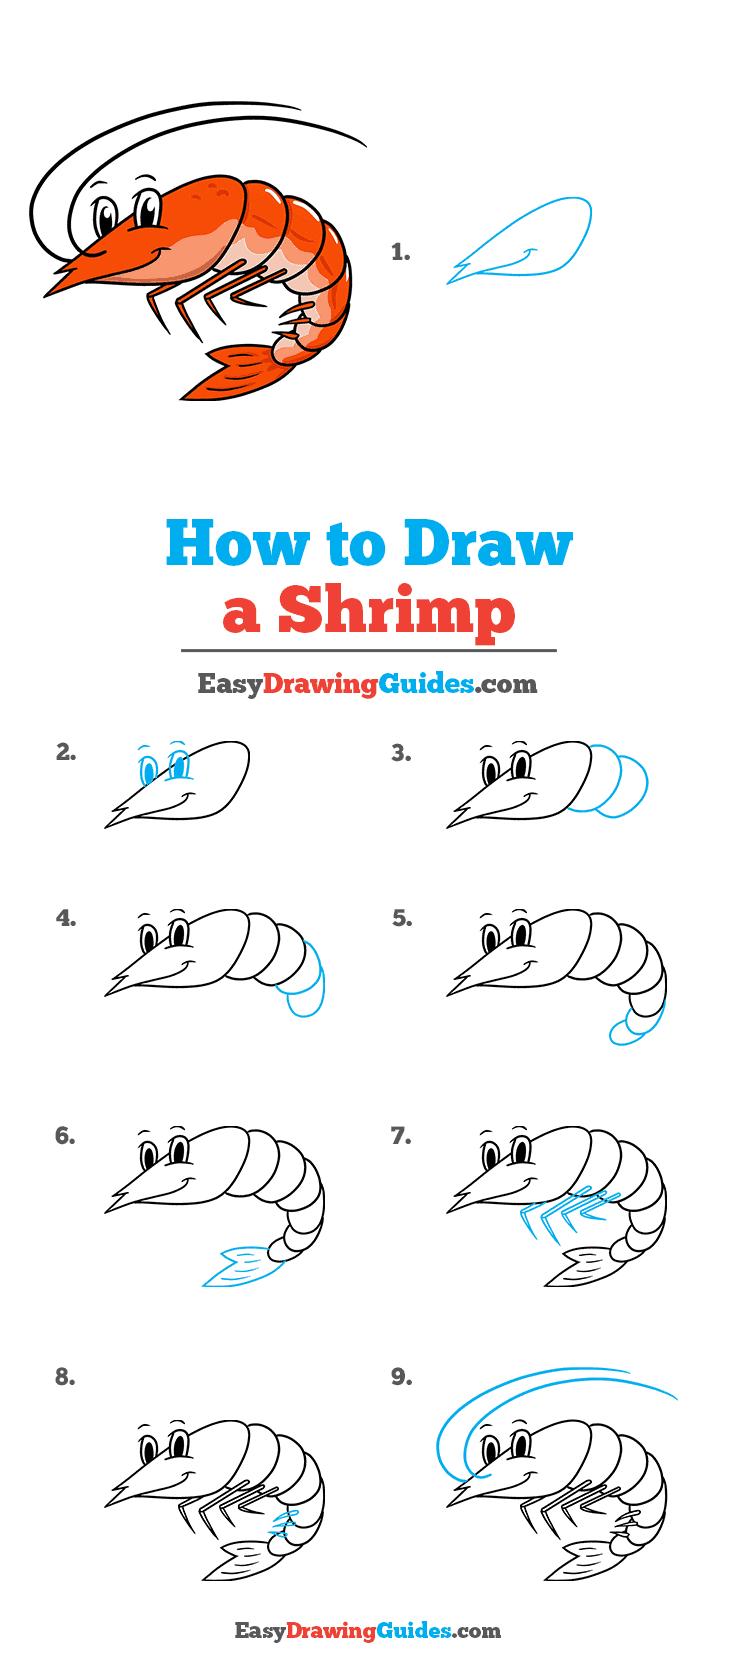 How to Draw a Shrimp Step by Step Tutorial Image